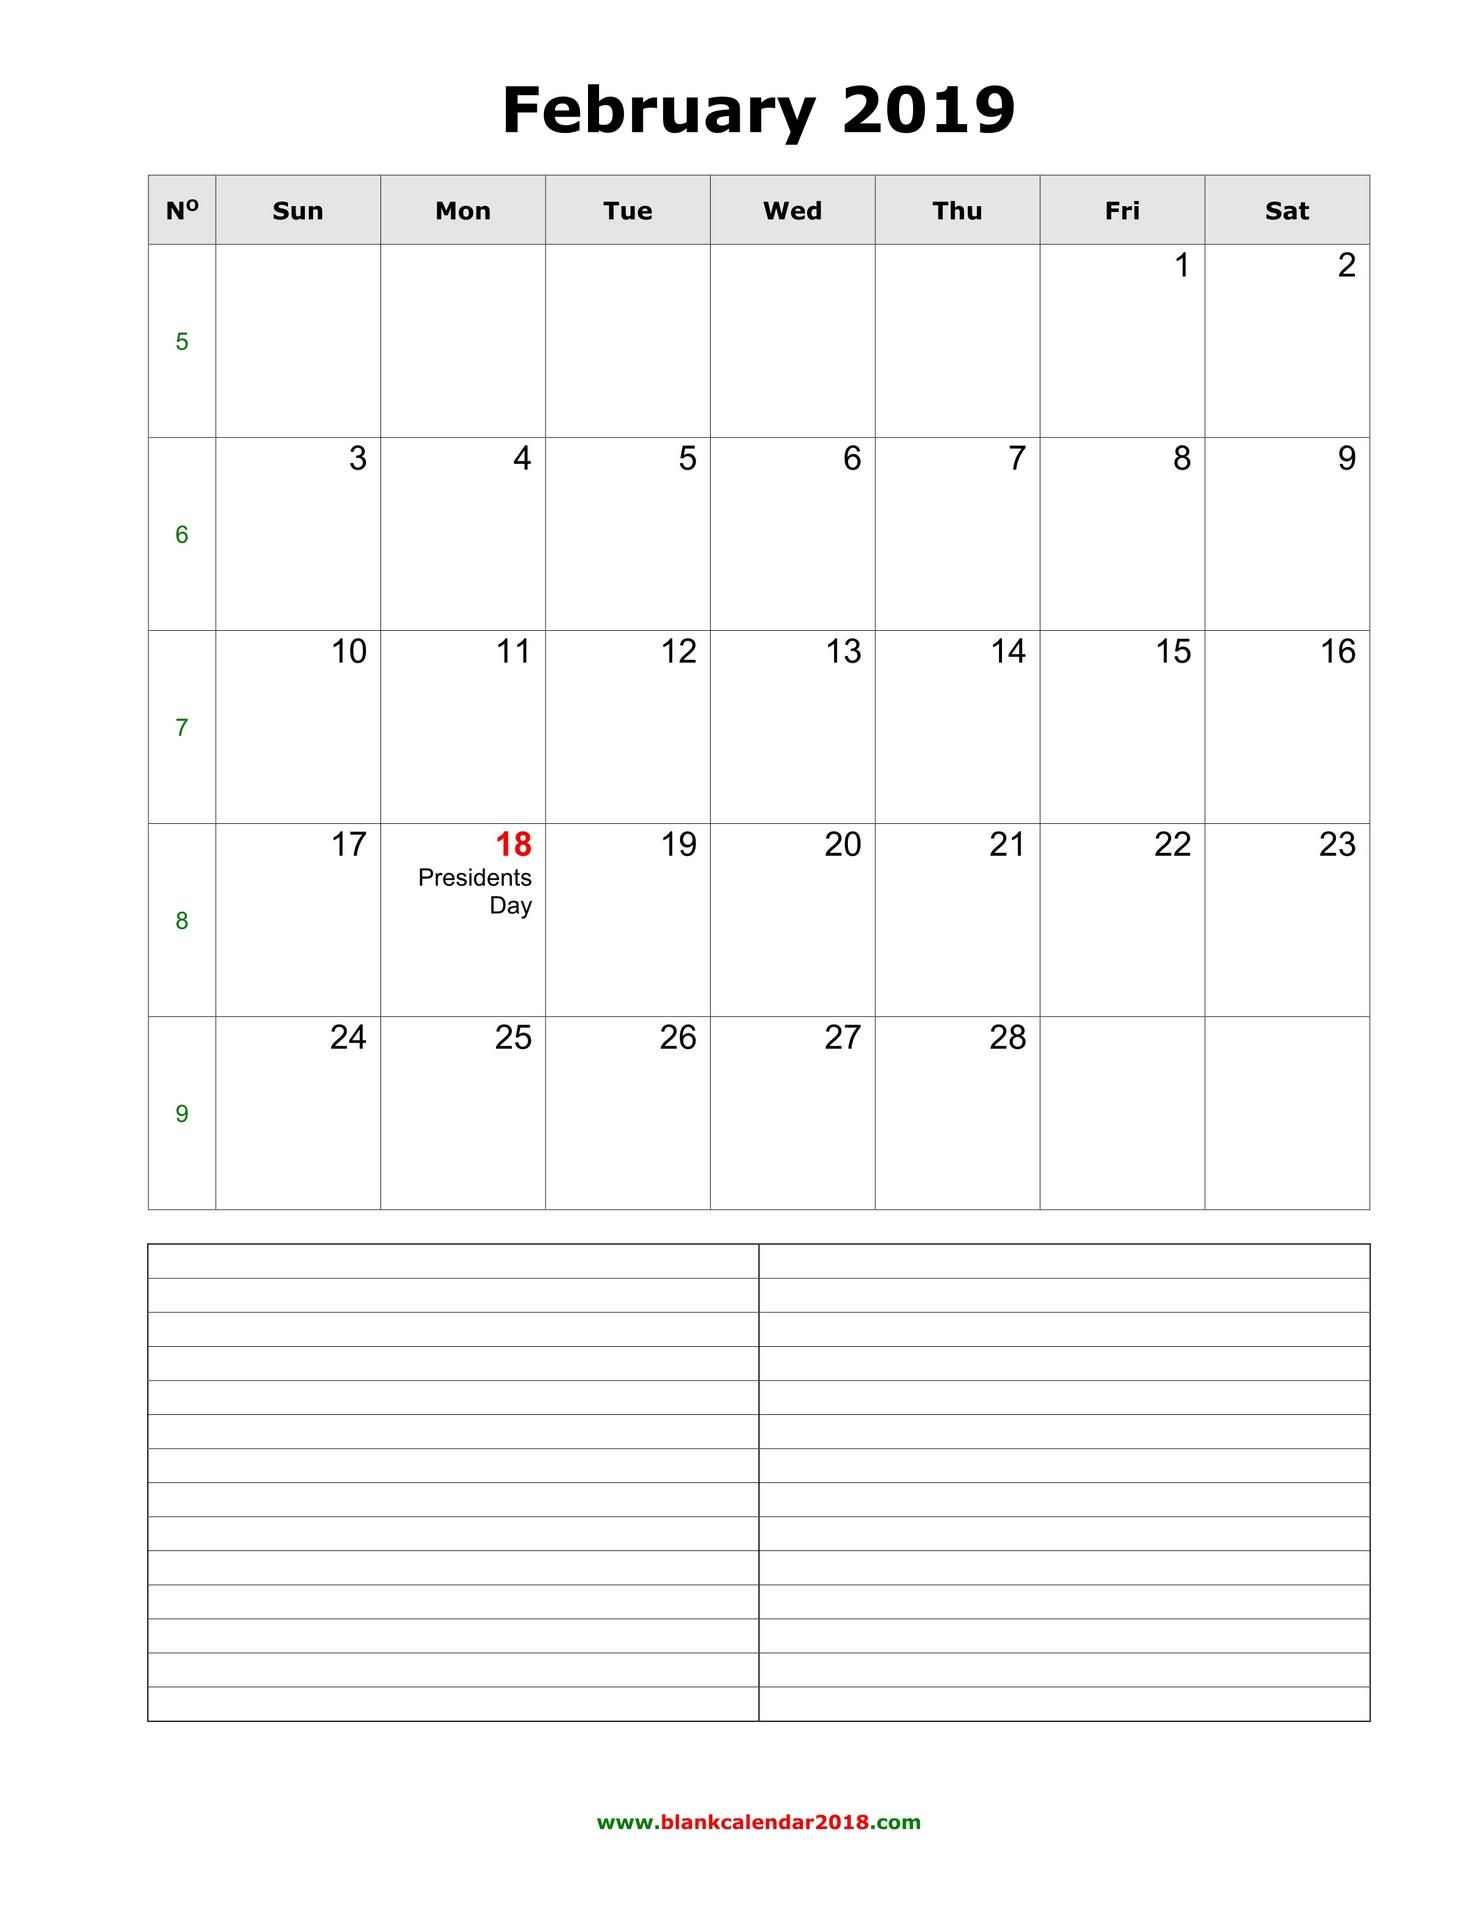 Lined February 2019 Calendar Blank Calendar for February 2019